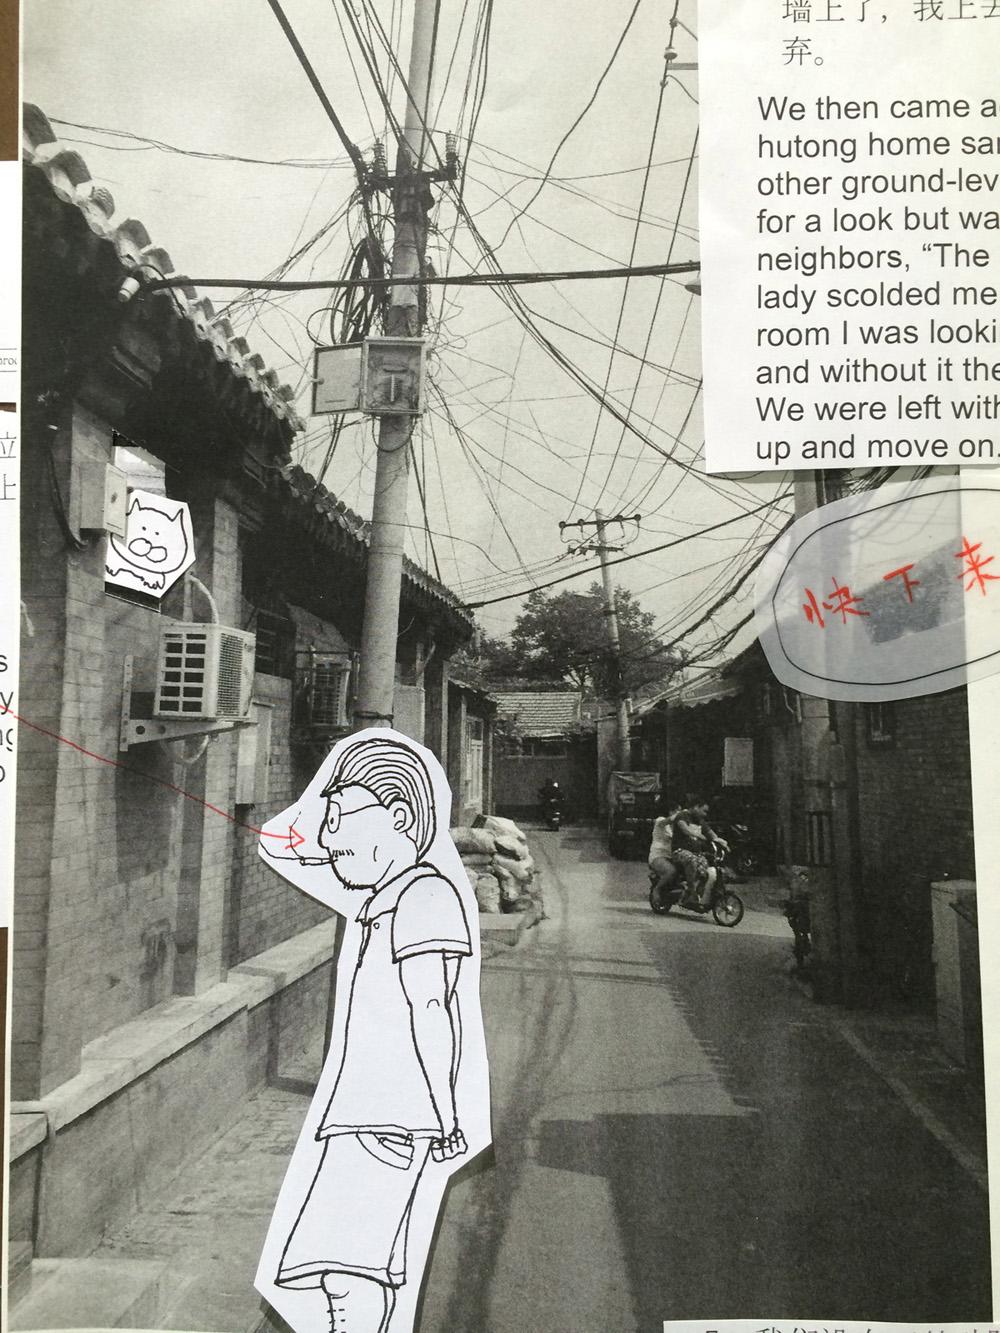 Caopu-humble-hostel-story-hisheji (1)